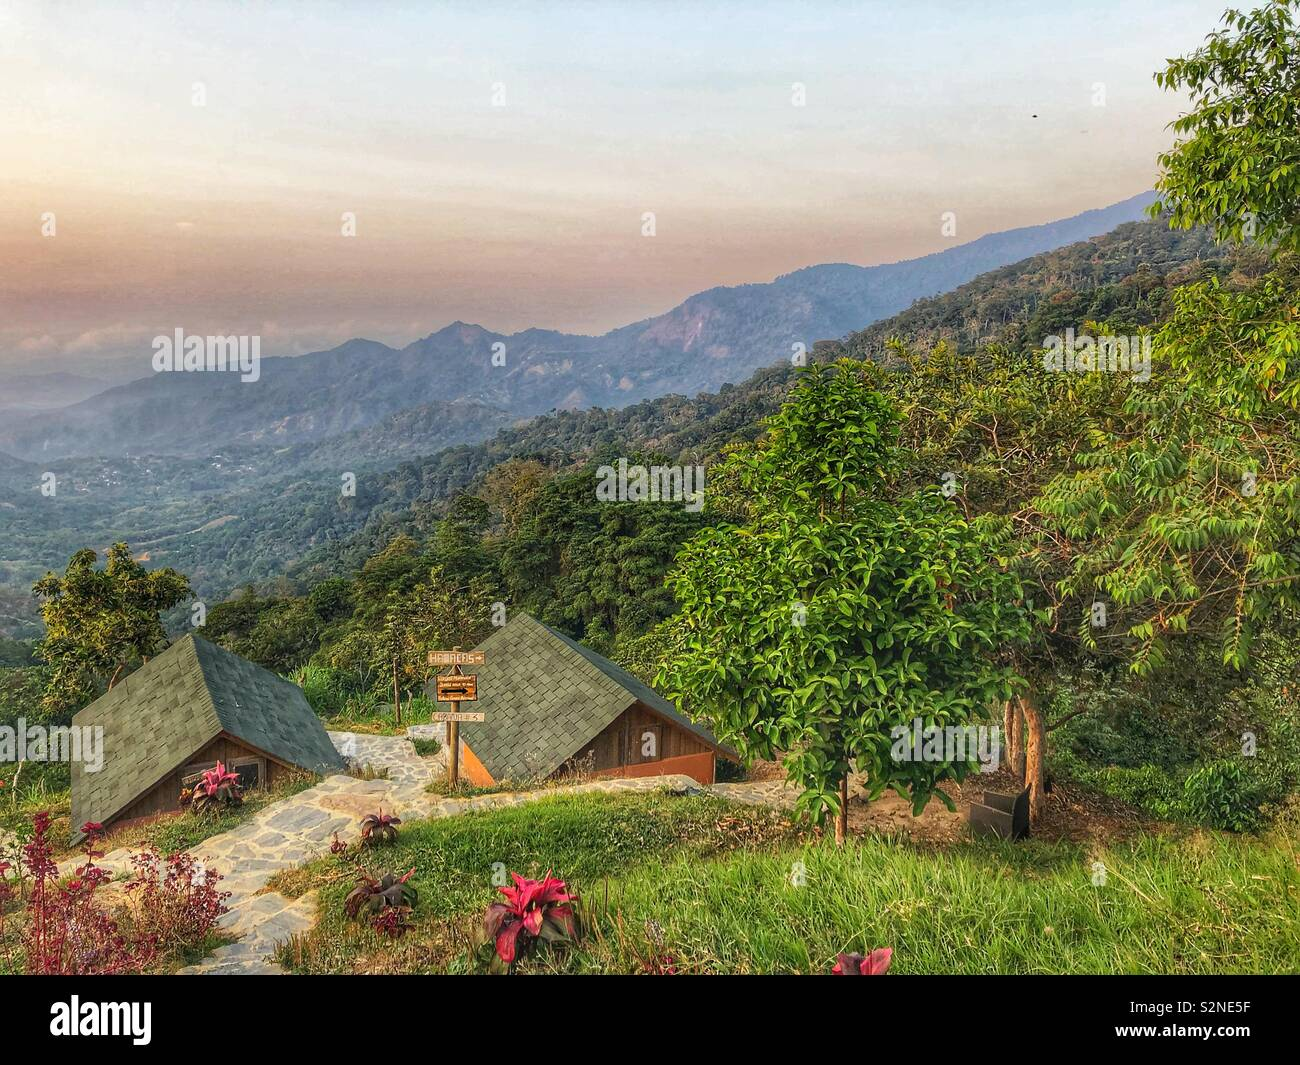 Picturesque Sierra Nevada mountain retreat in Santa Marta, Colombia. - Stock Image